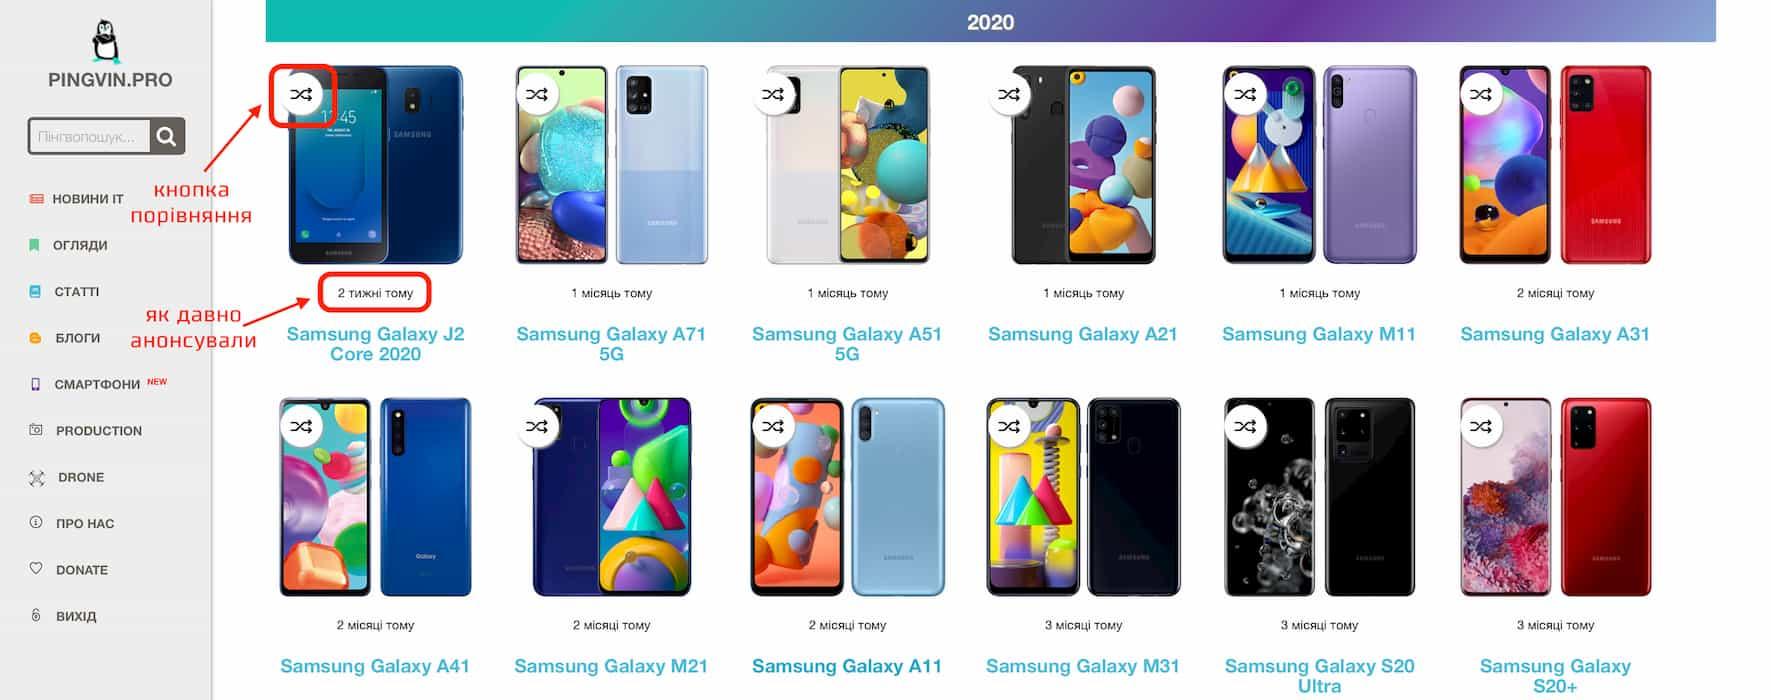 Pingvin Pro - база смартфонів - Samsung